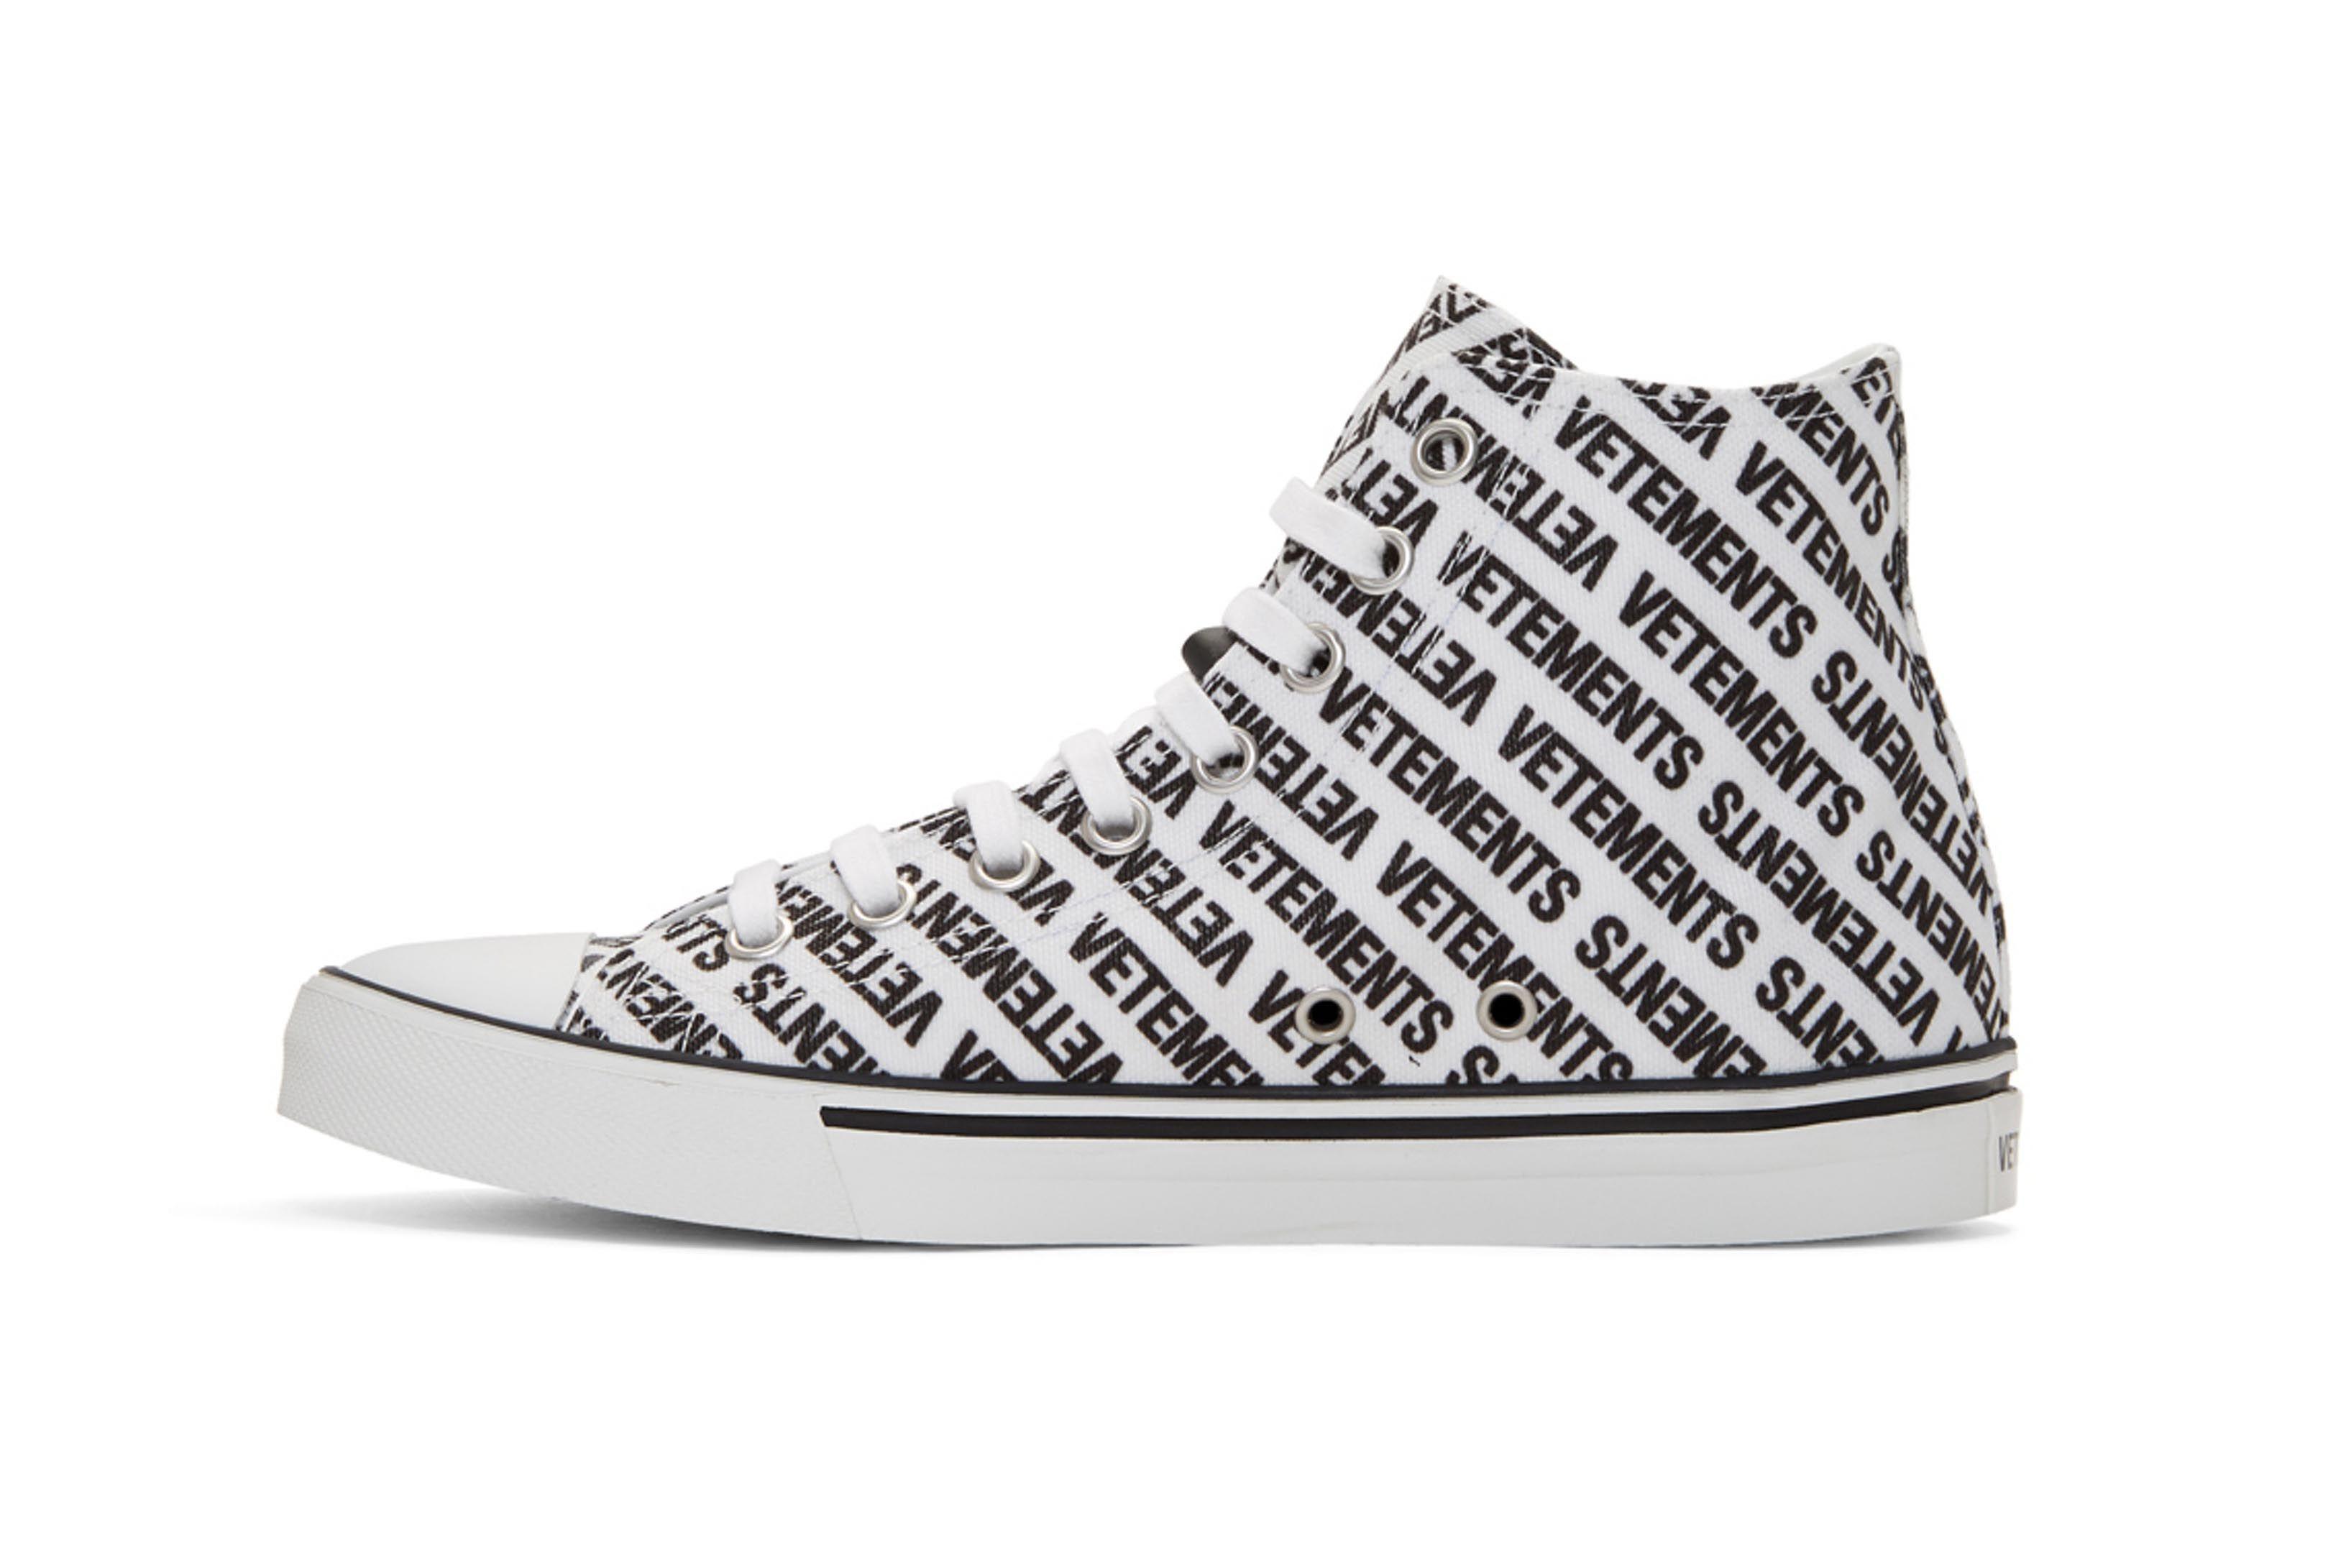 Vetements Logo High Top Sneakers Black White 3 Sneaker Freaker